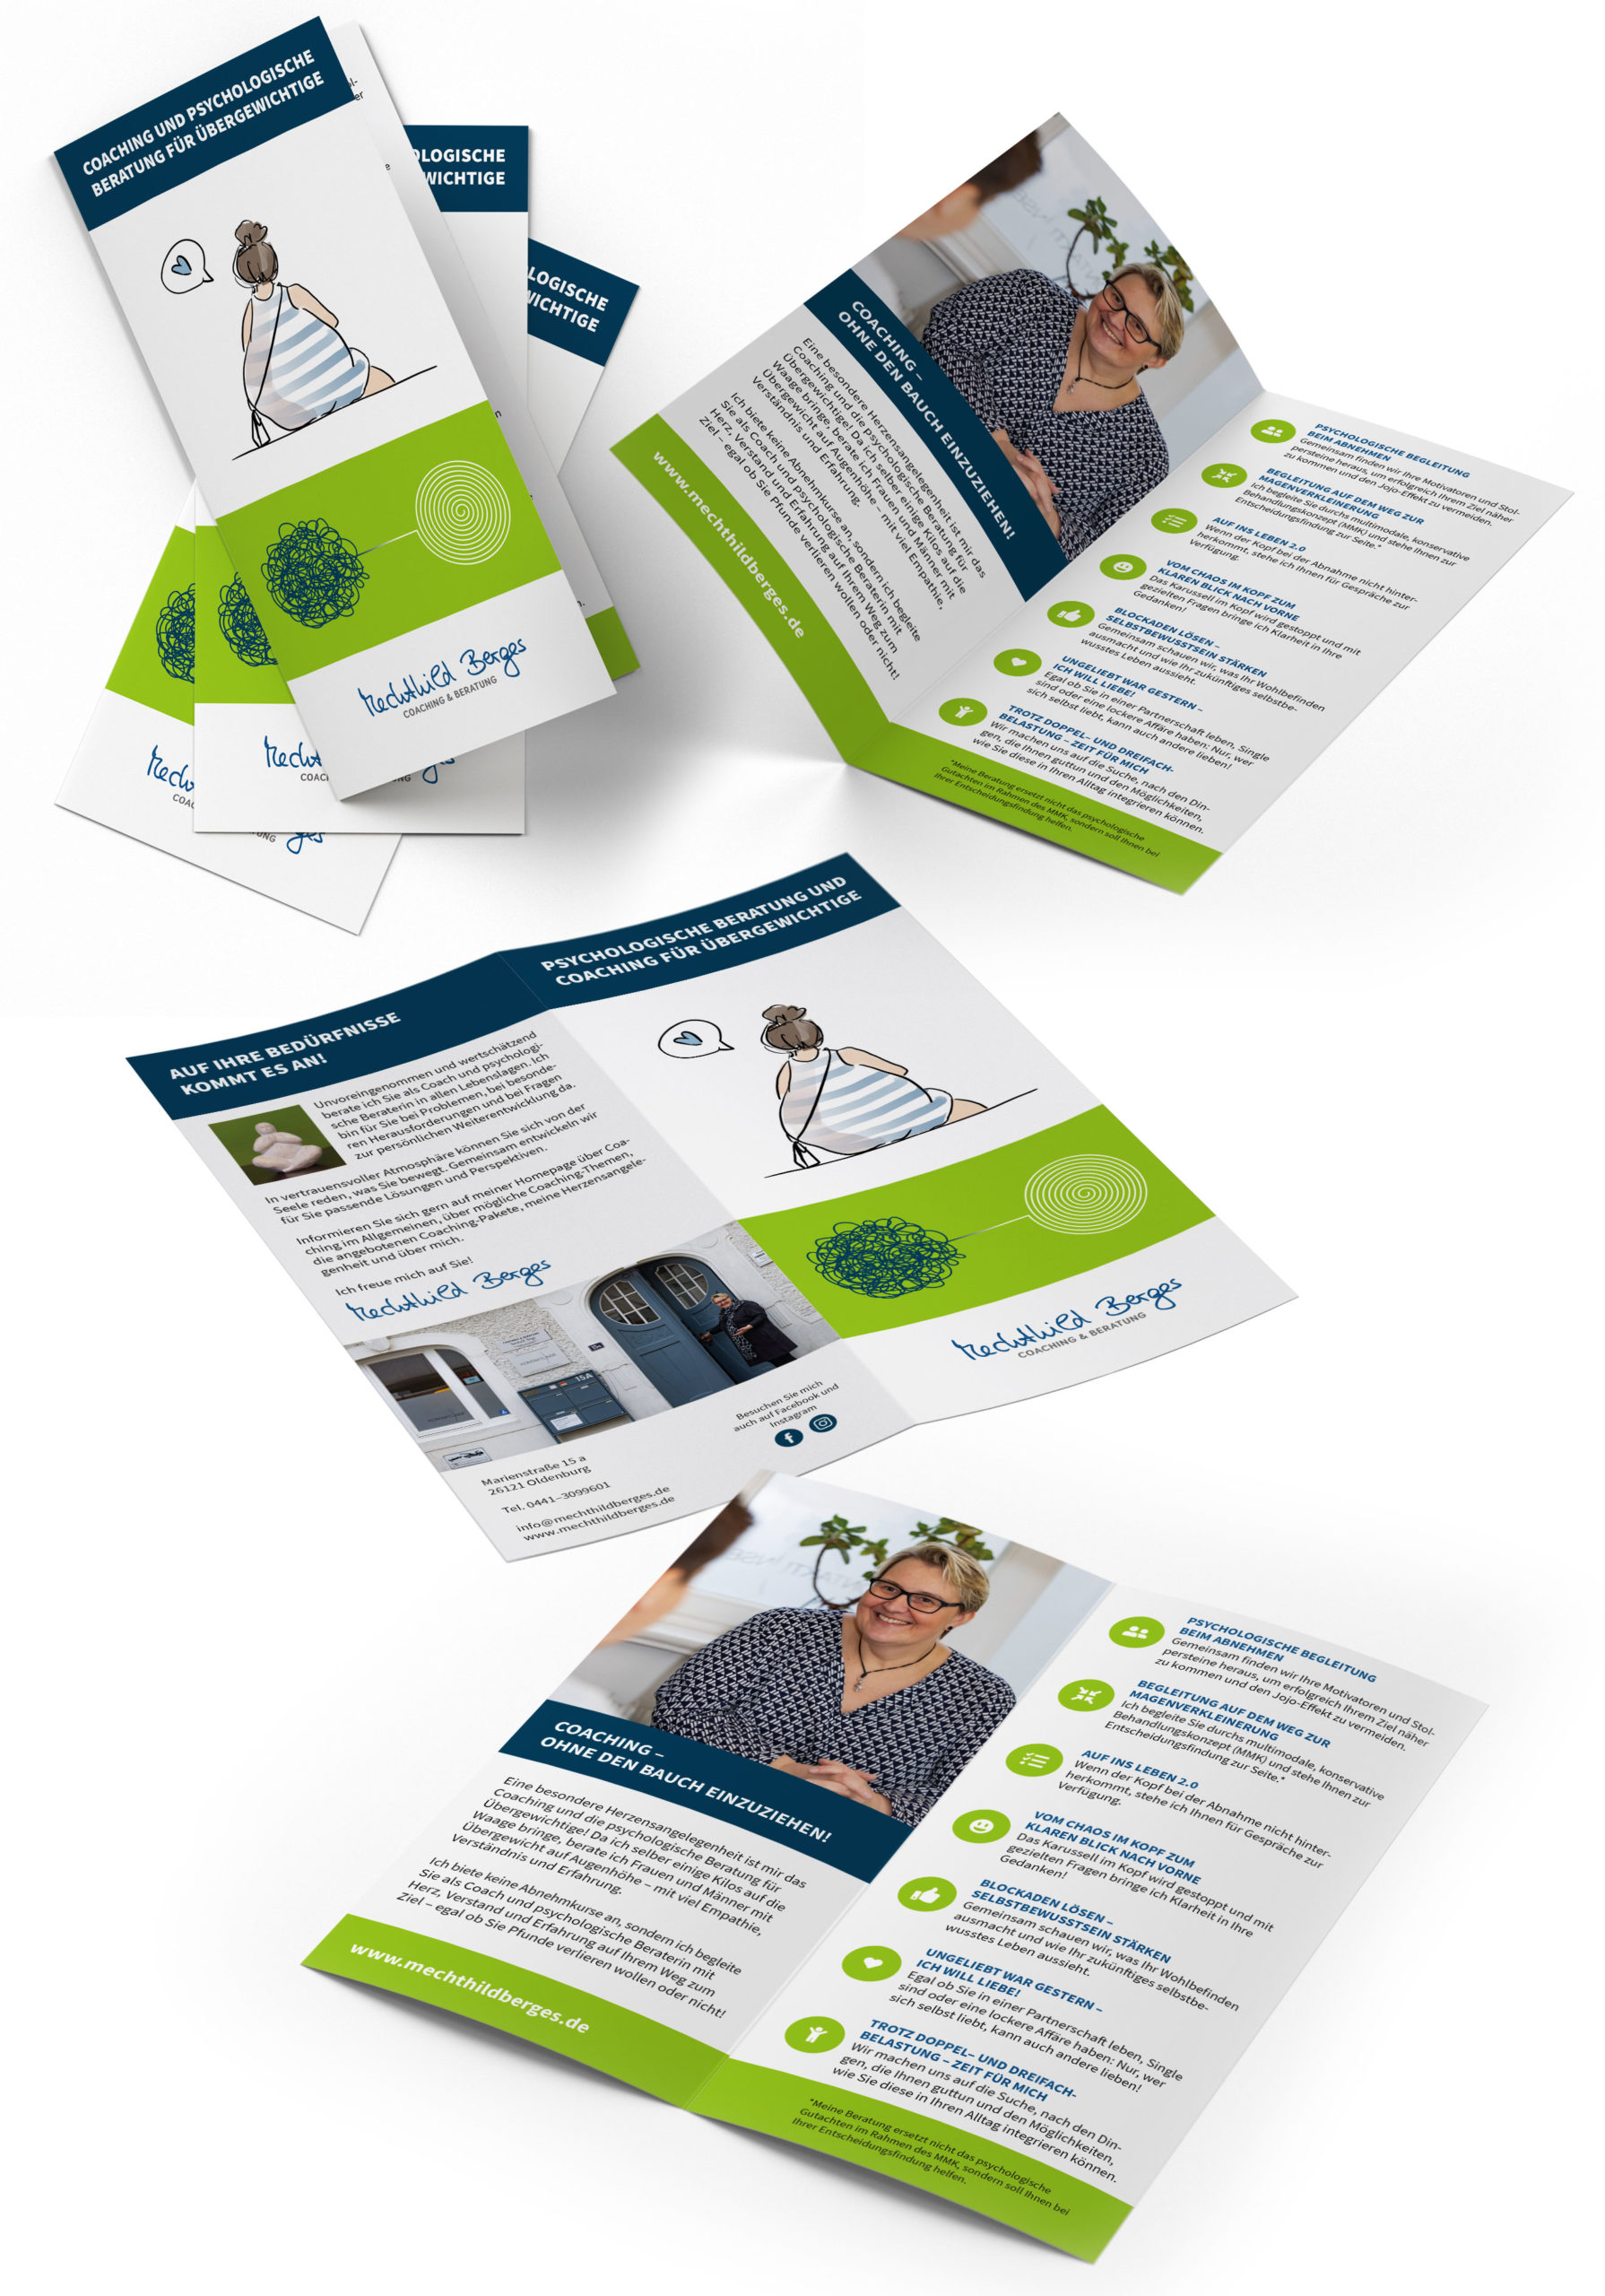 Design sozialer Sektor Mechthild Berges Coaching & Beratung Oldenburg – Flyer